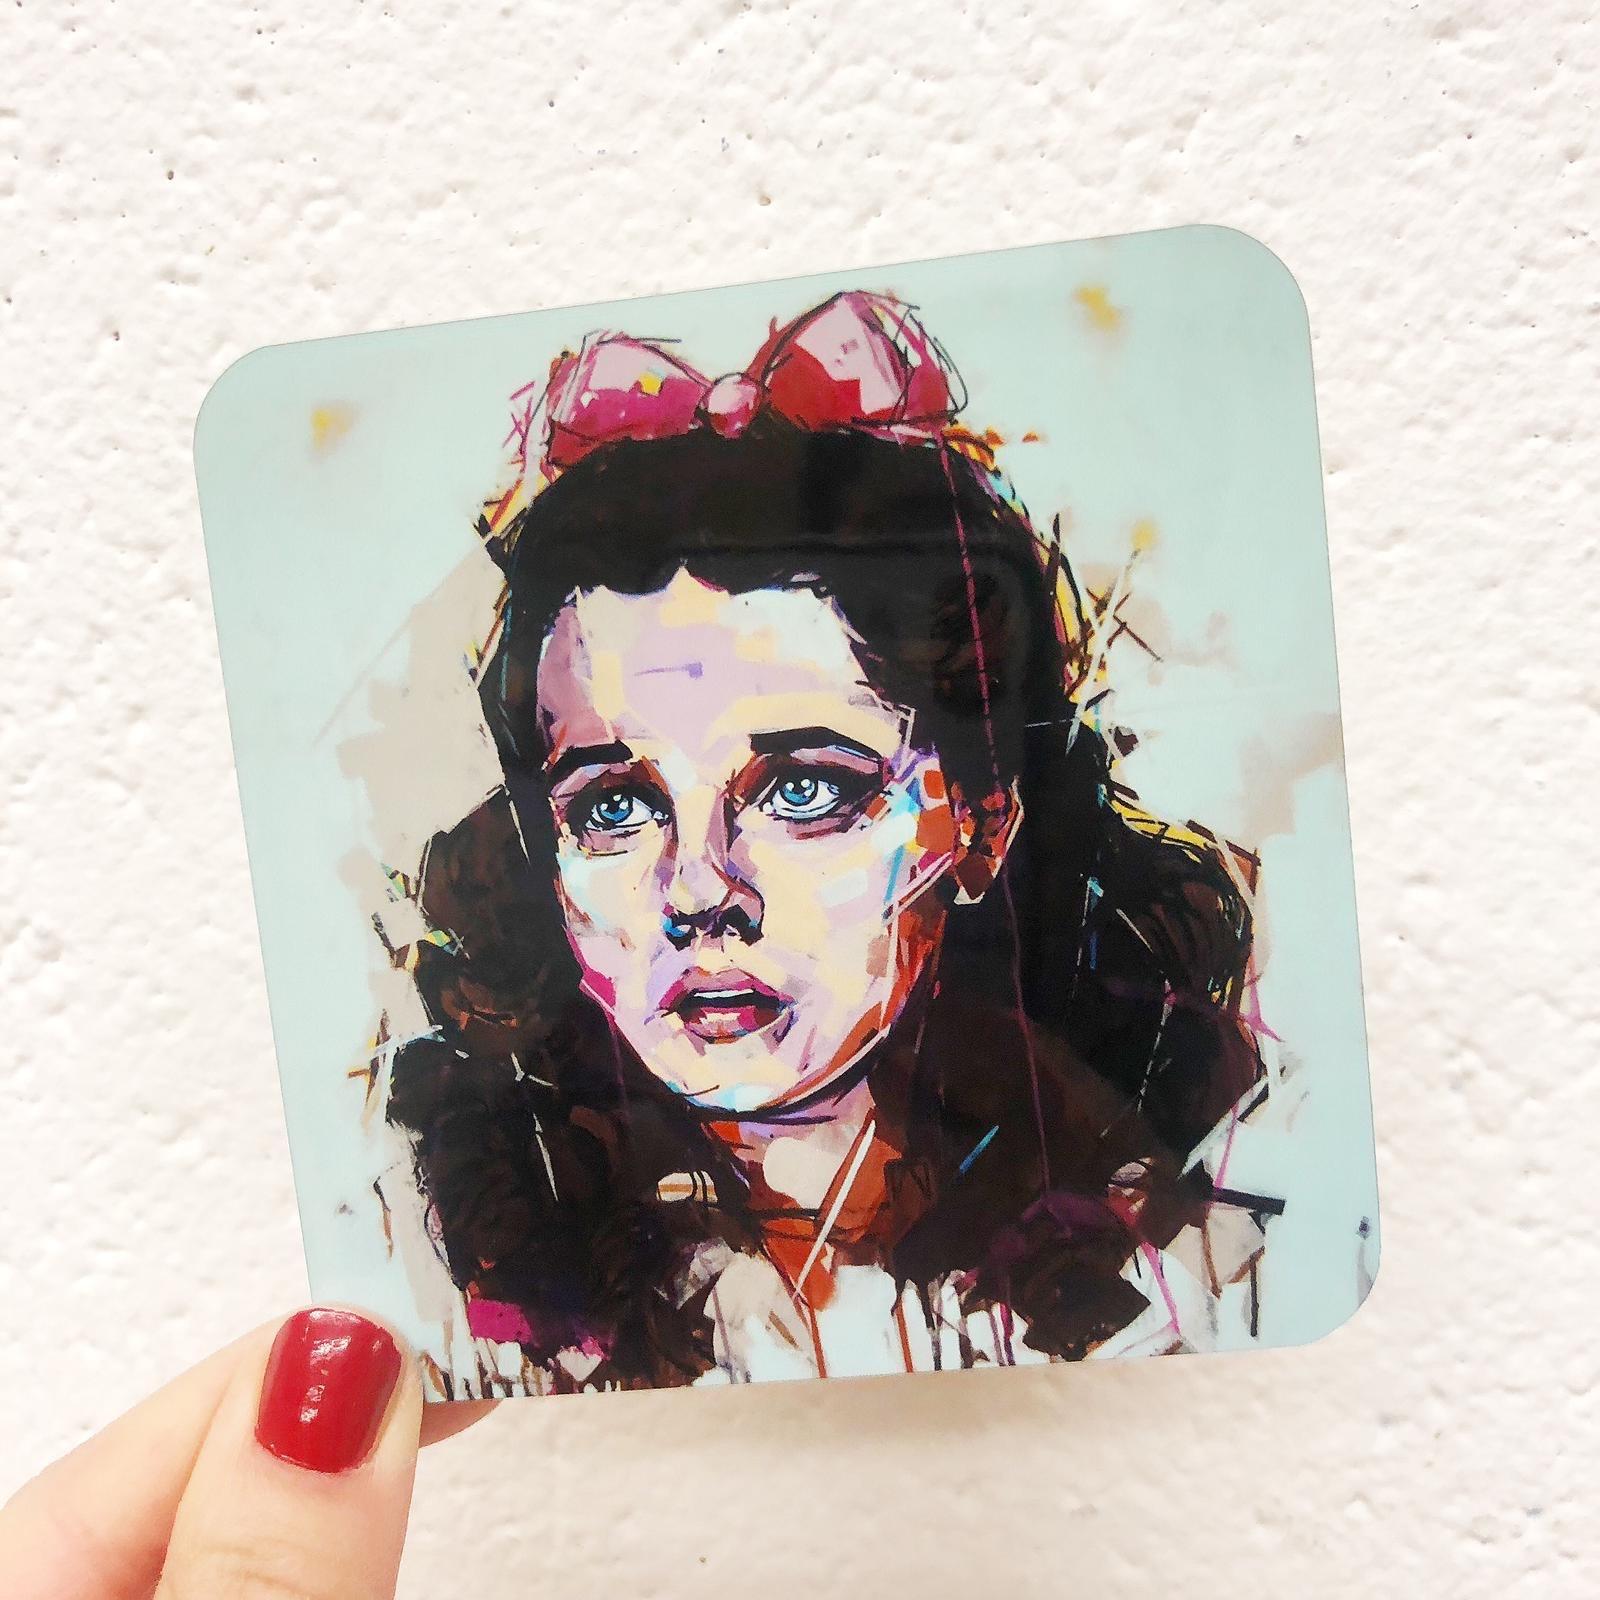 Personalised photo coasters: 'Dorothy' Judy Garland by Laura Selevos – buy on ArtWOW